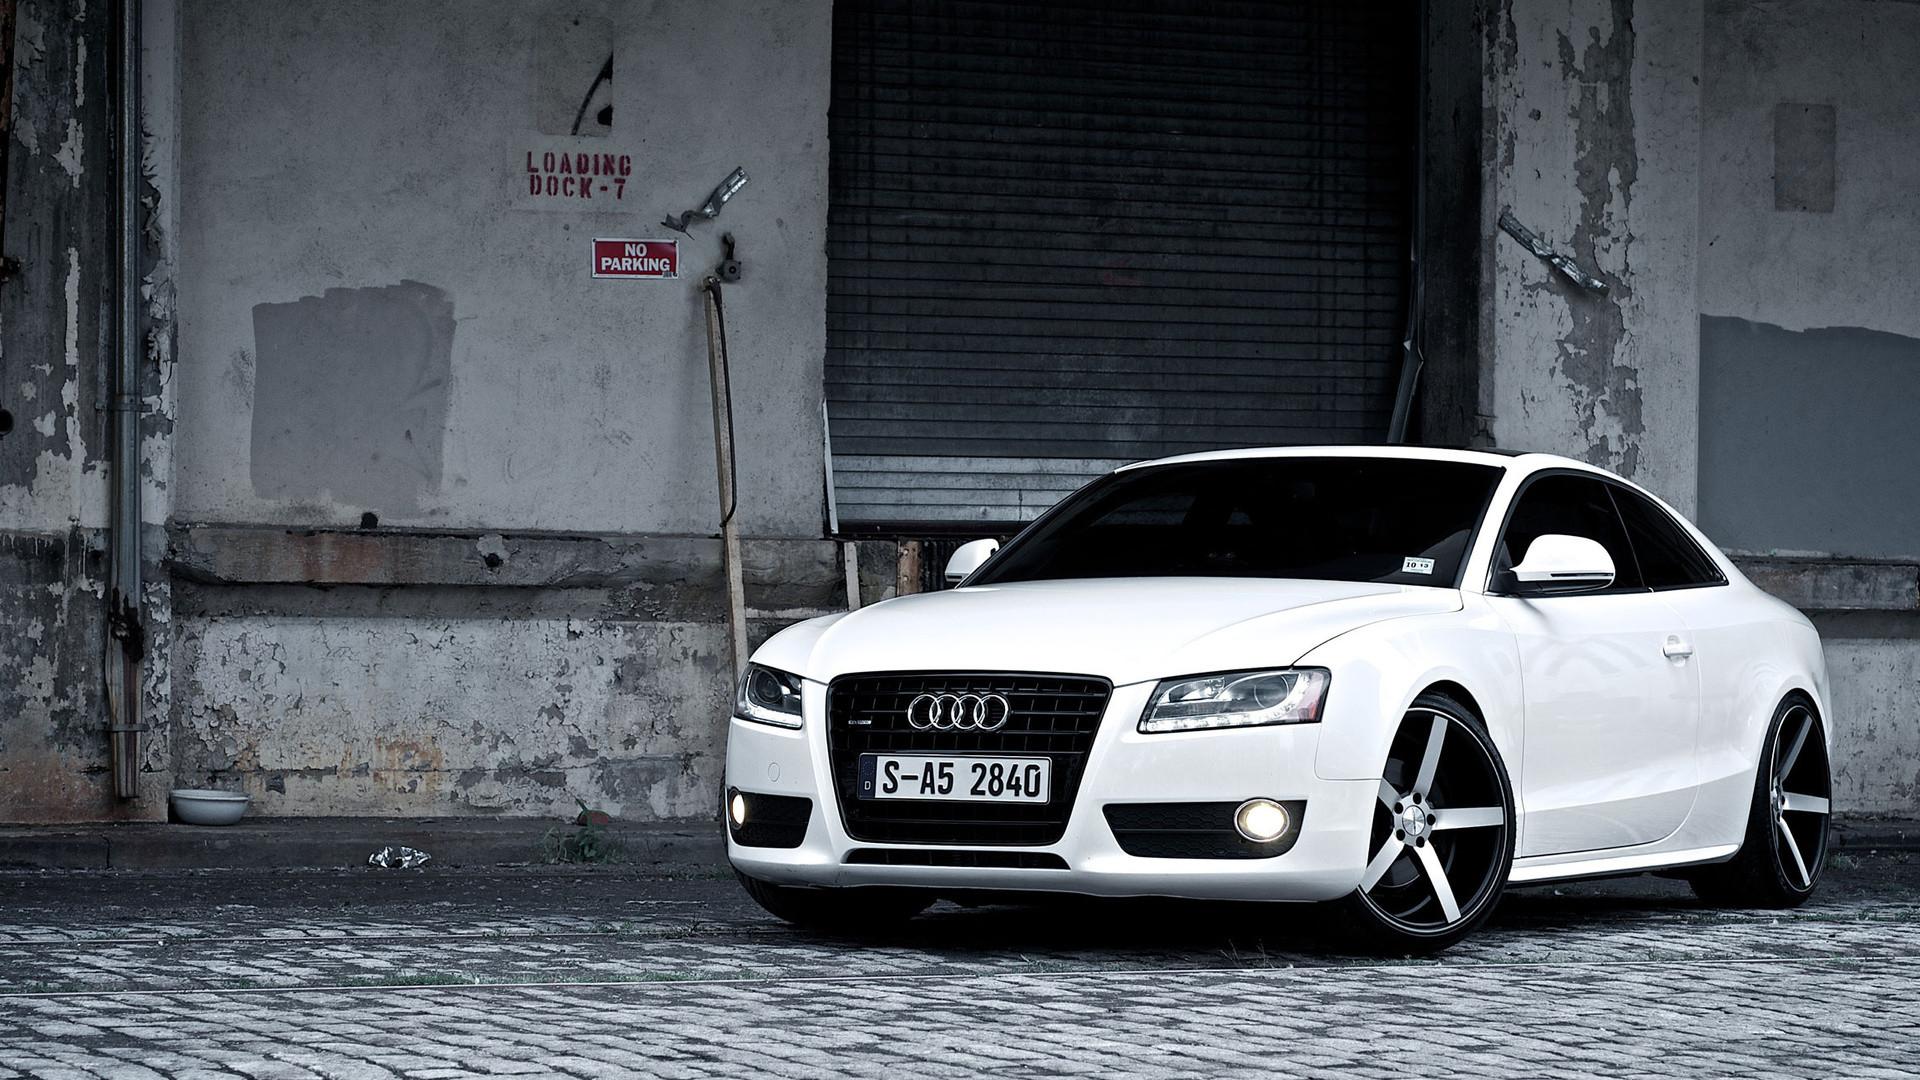 Audi S5 Wallpaper 77 Images